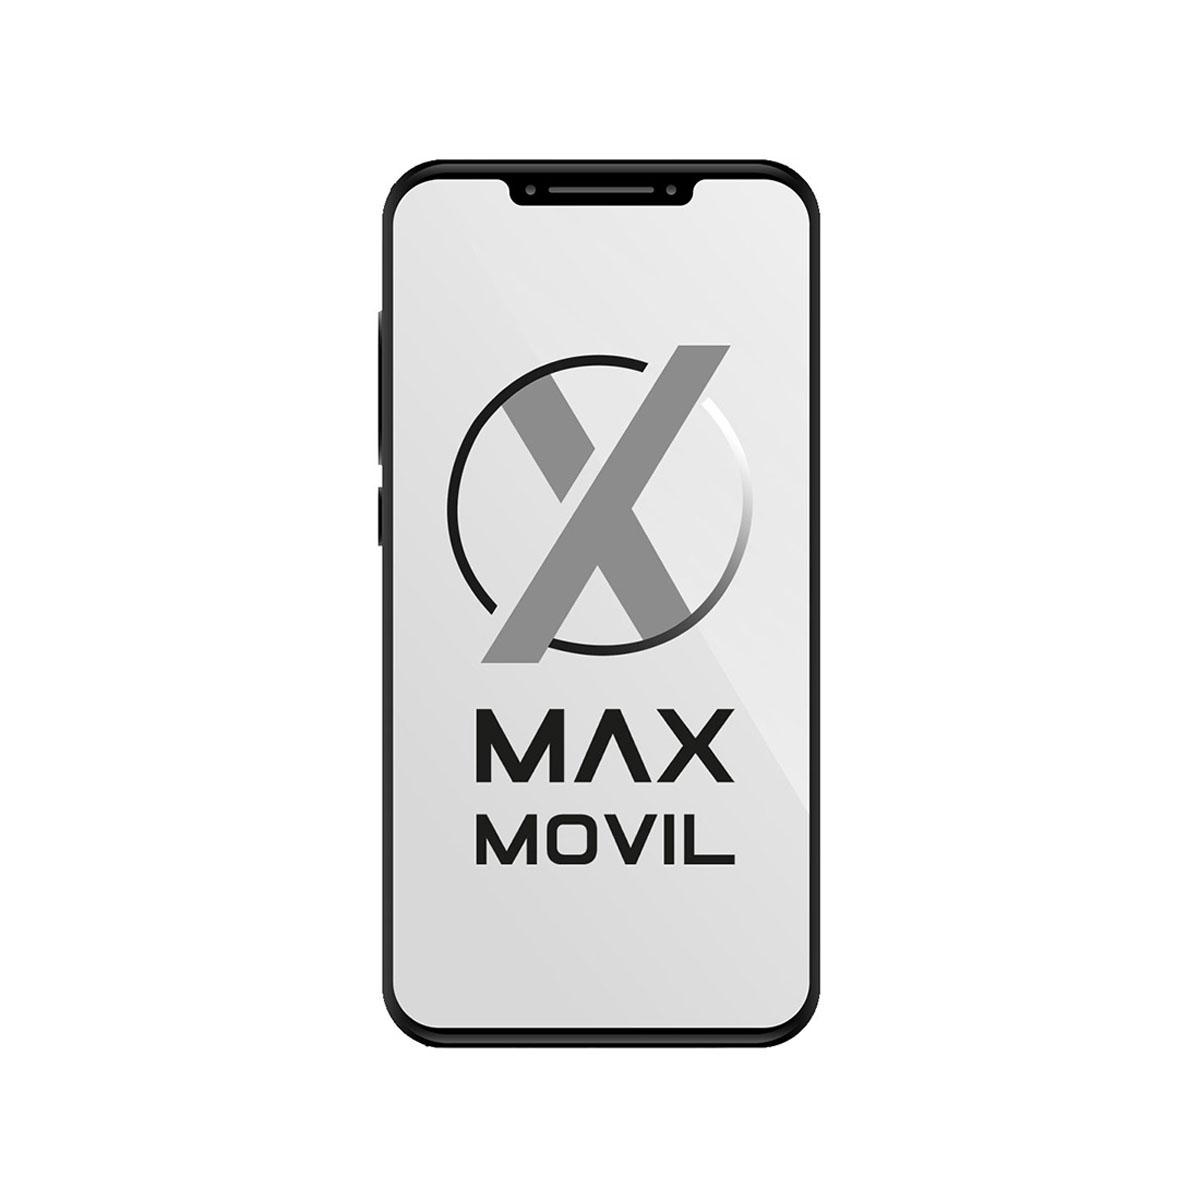 Comprar online Motorola Moto X Style